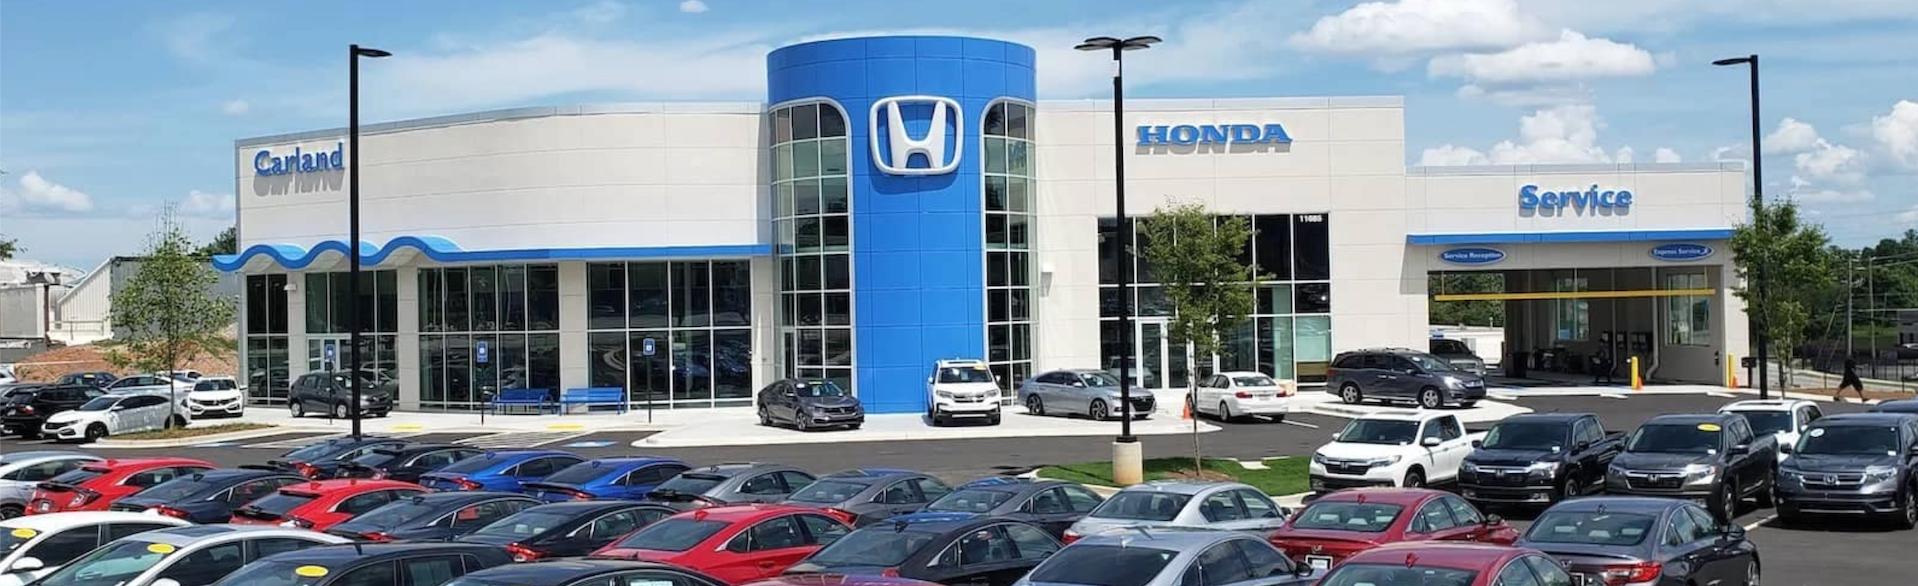 Exterior of Honda Carland - Roswell, GA